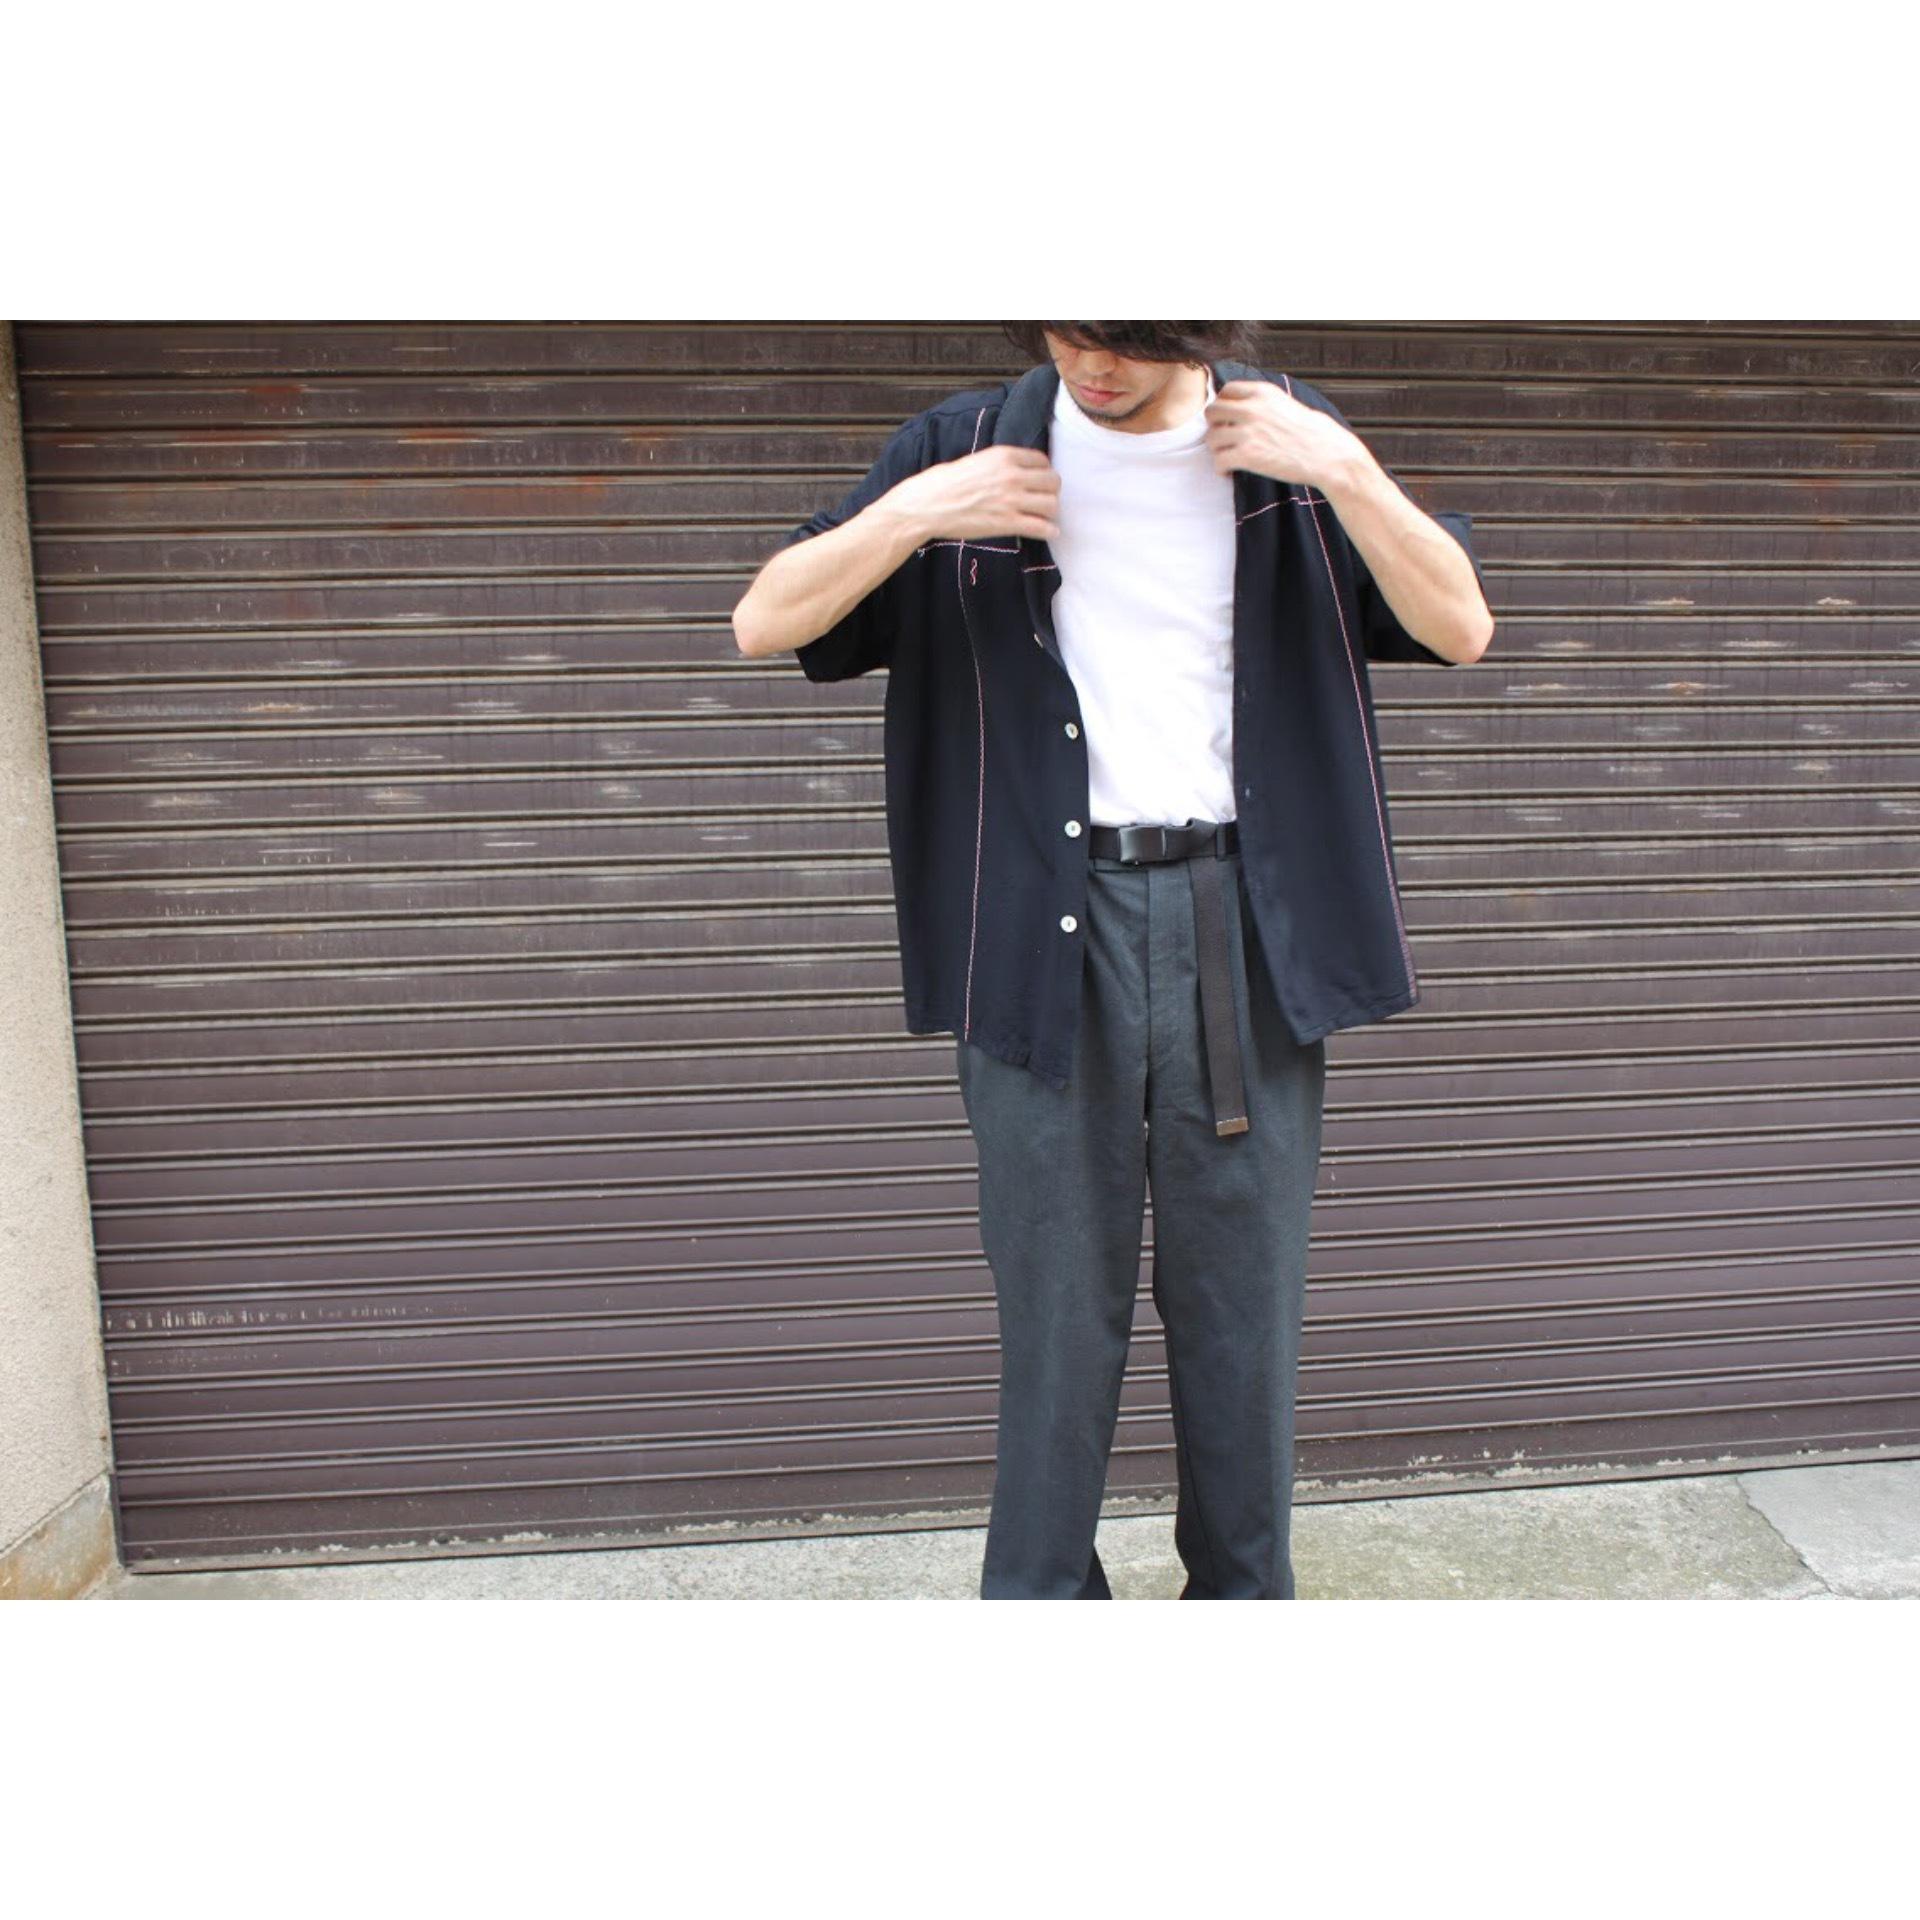 Vintage open collar shirt